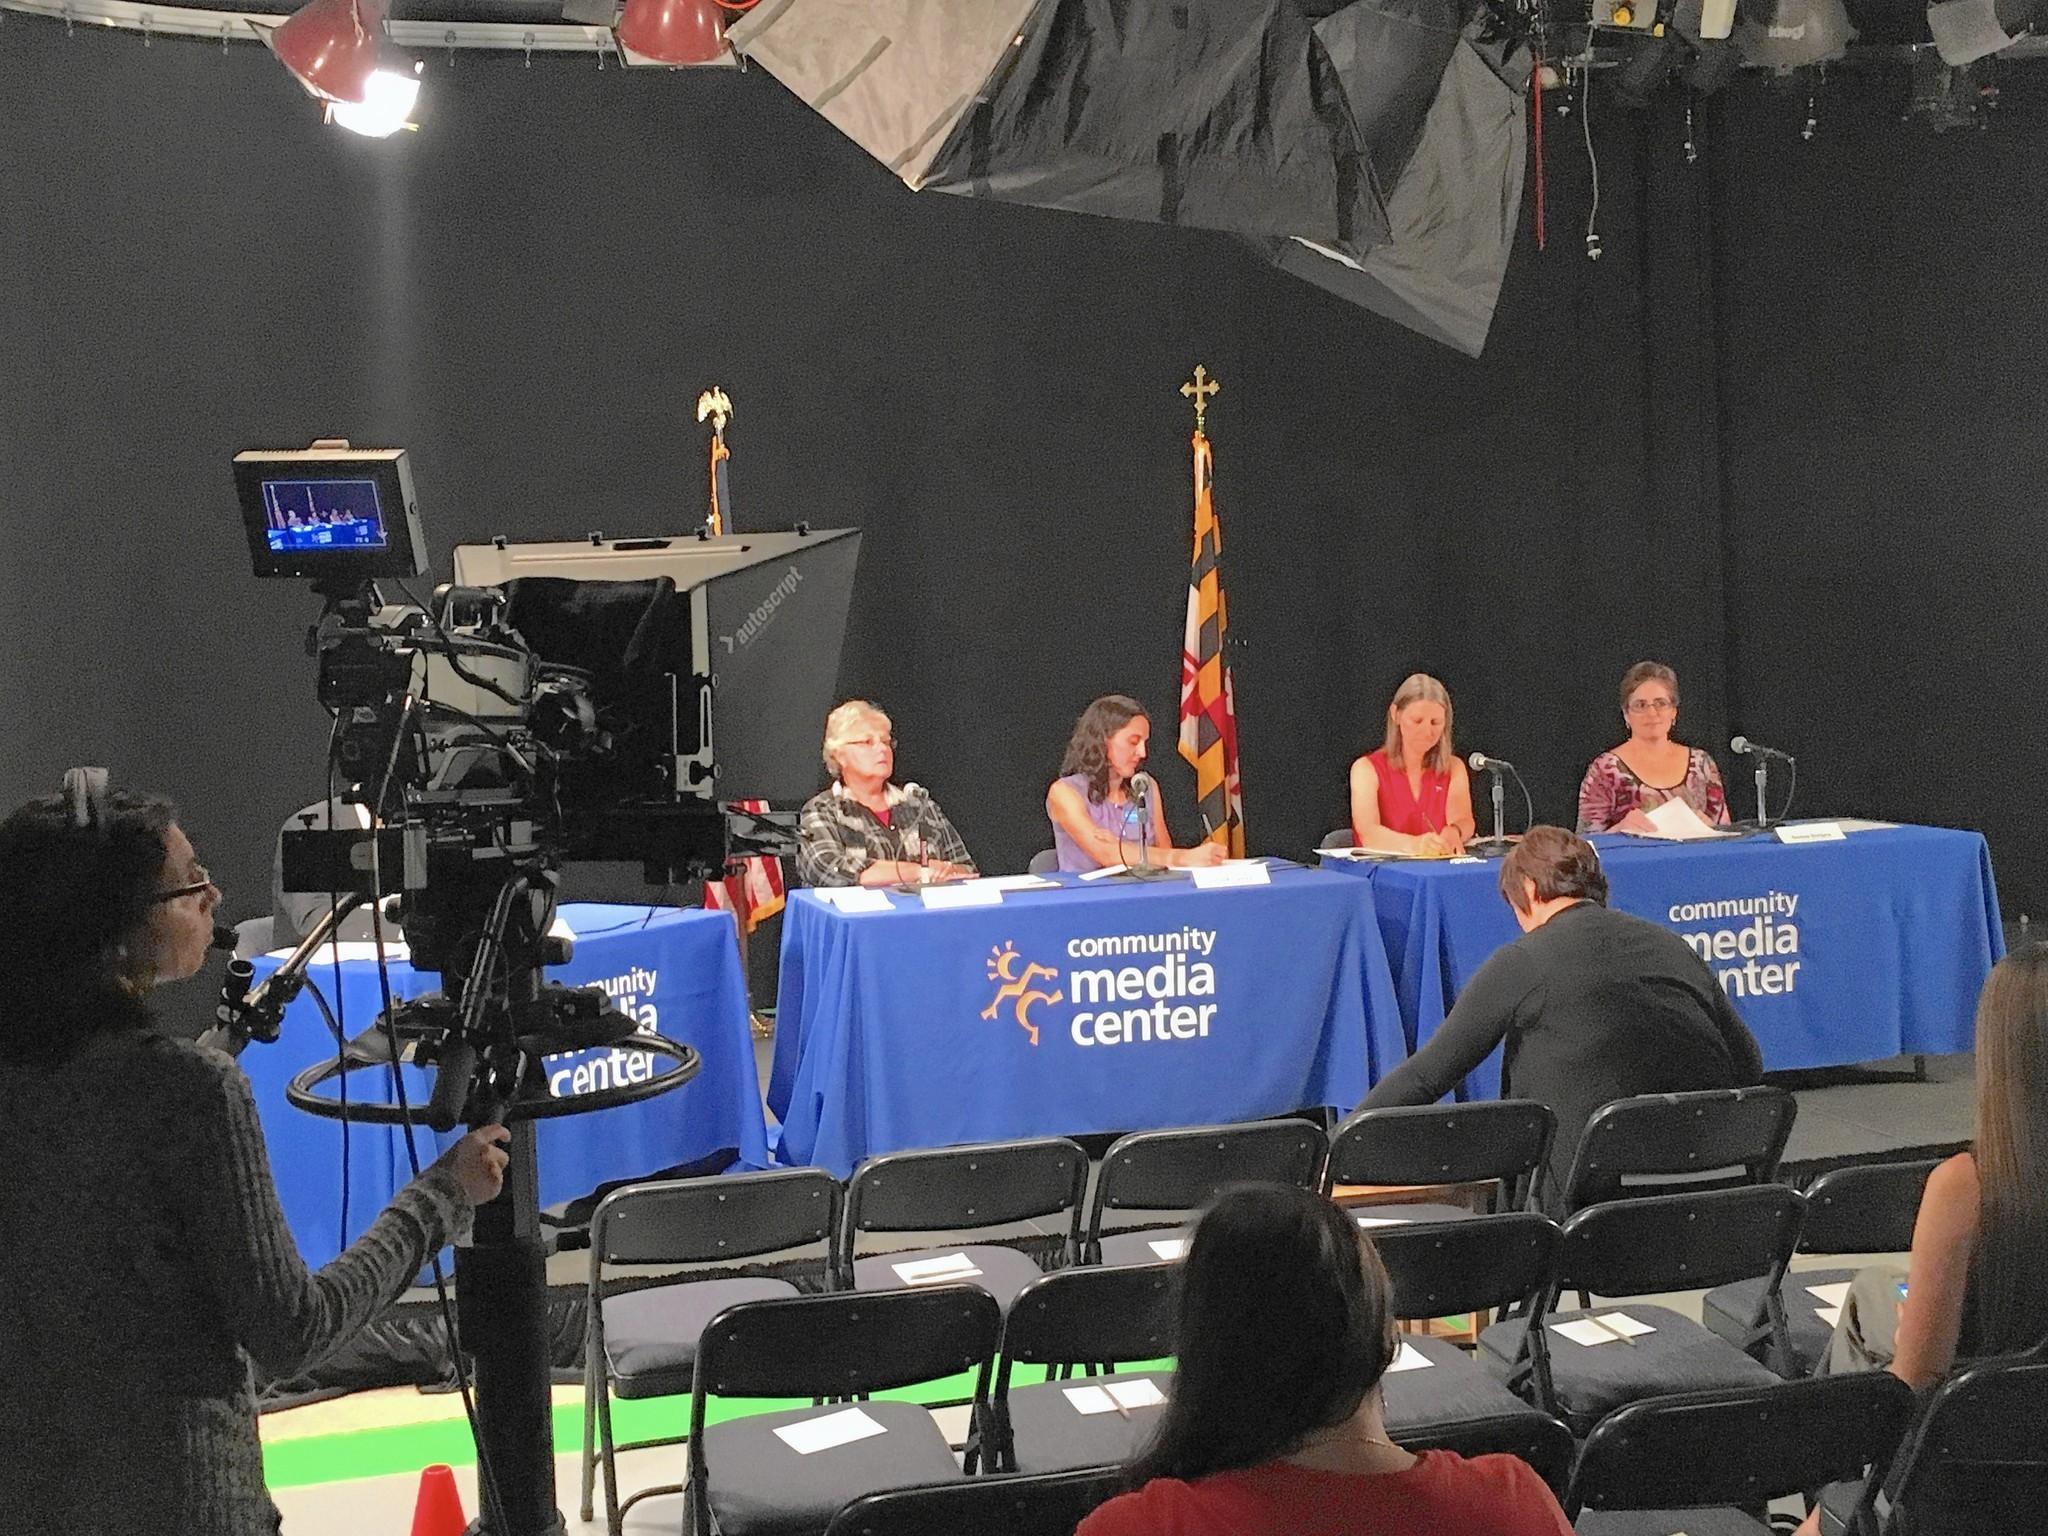 School board candidates go head-to-head in forum - Carroll